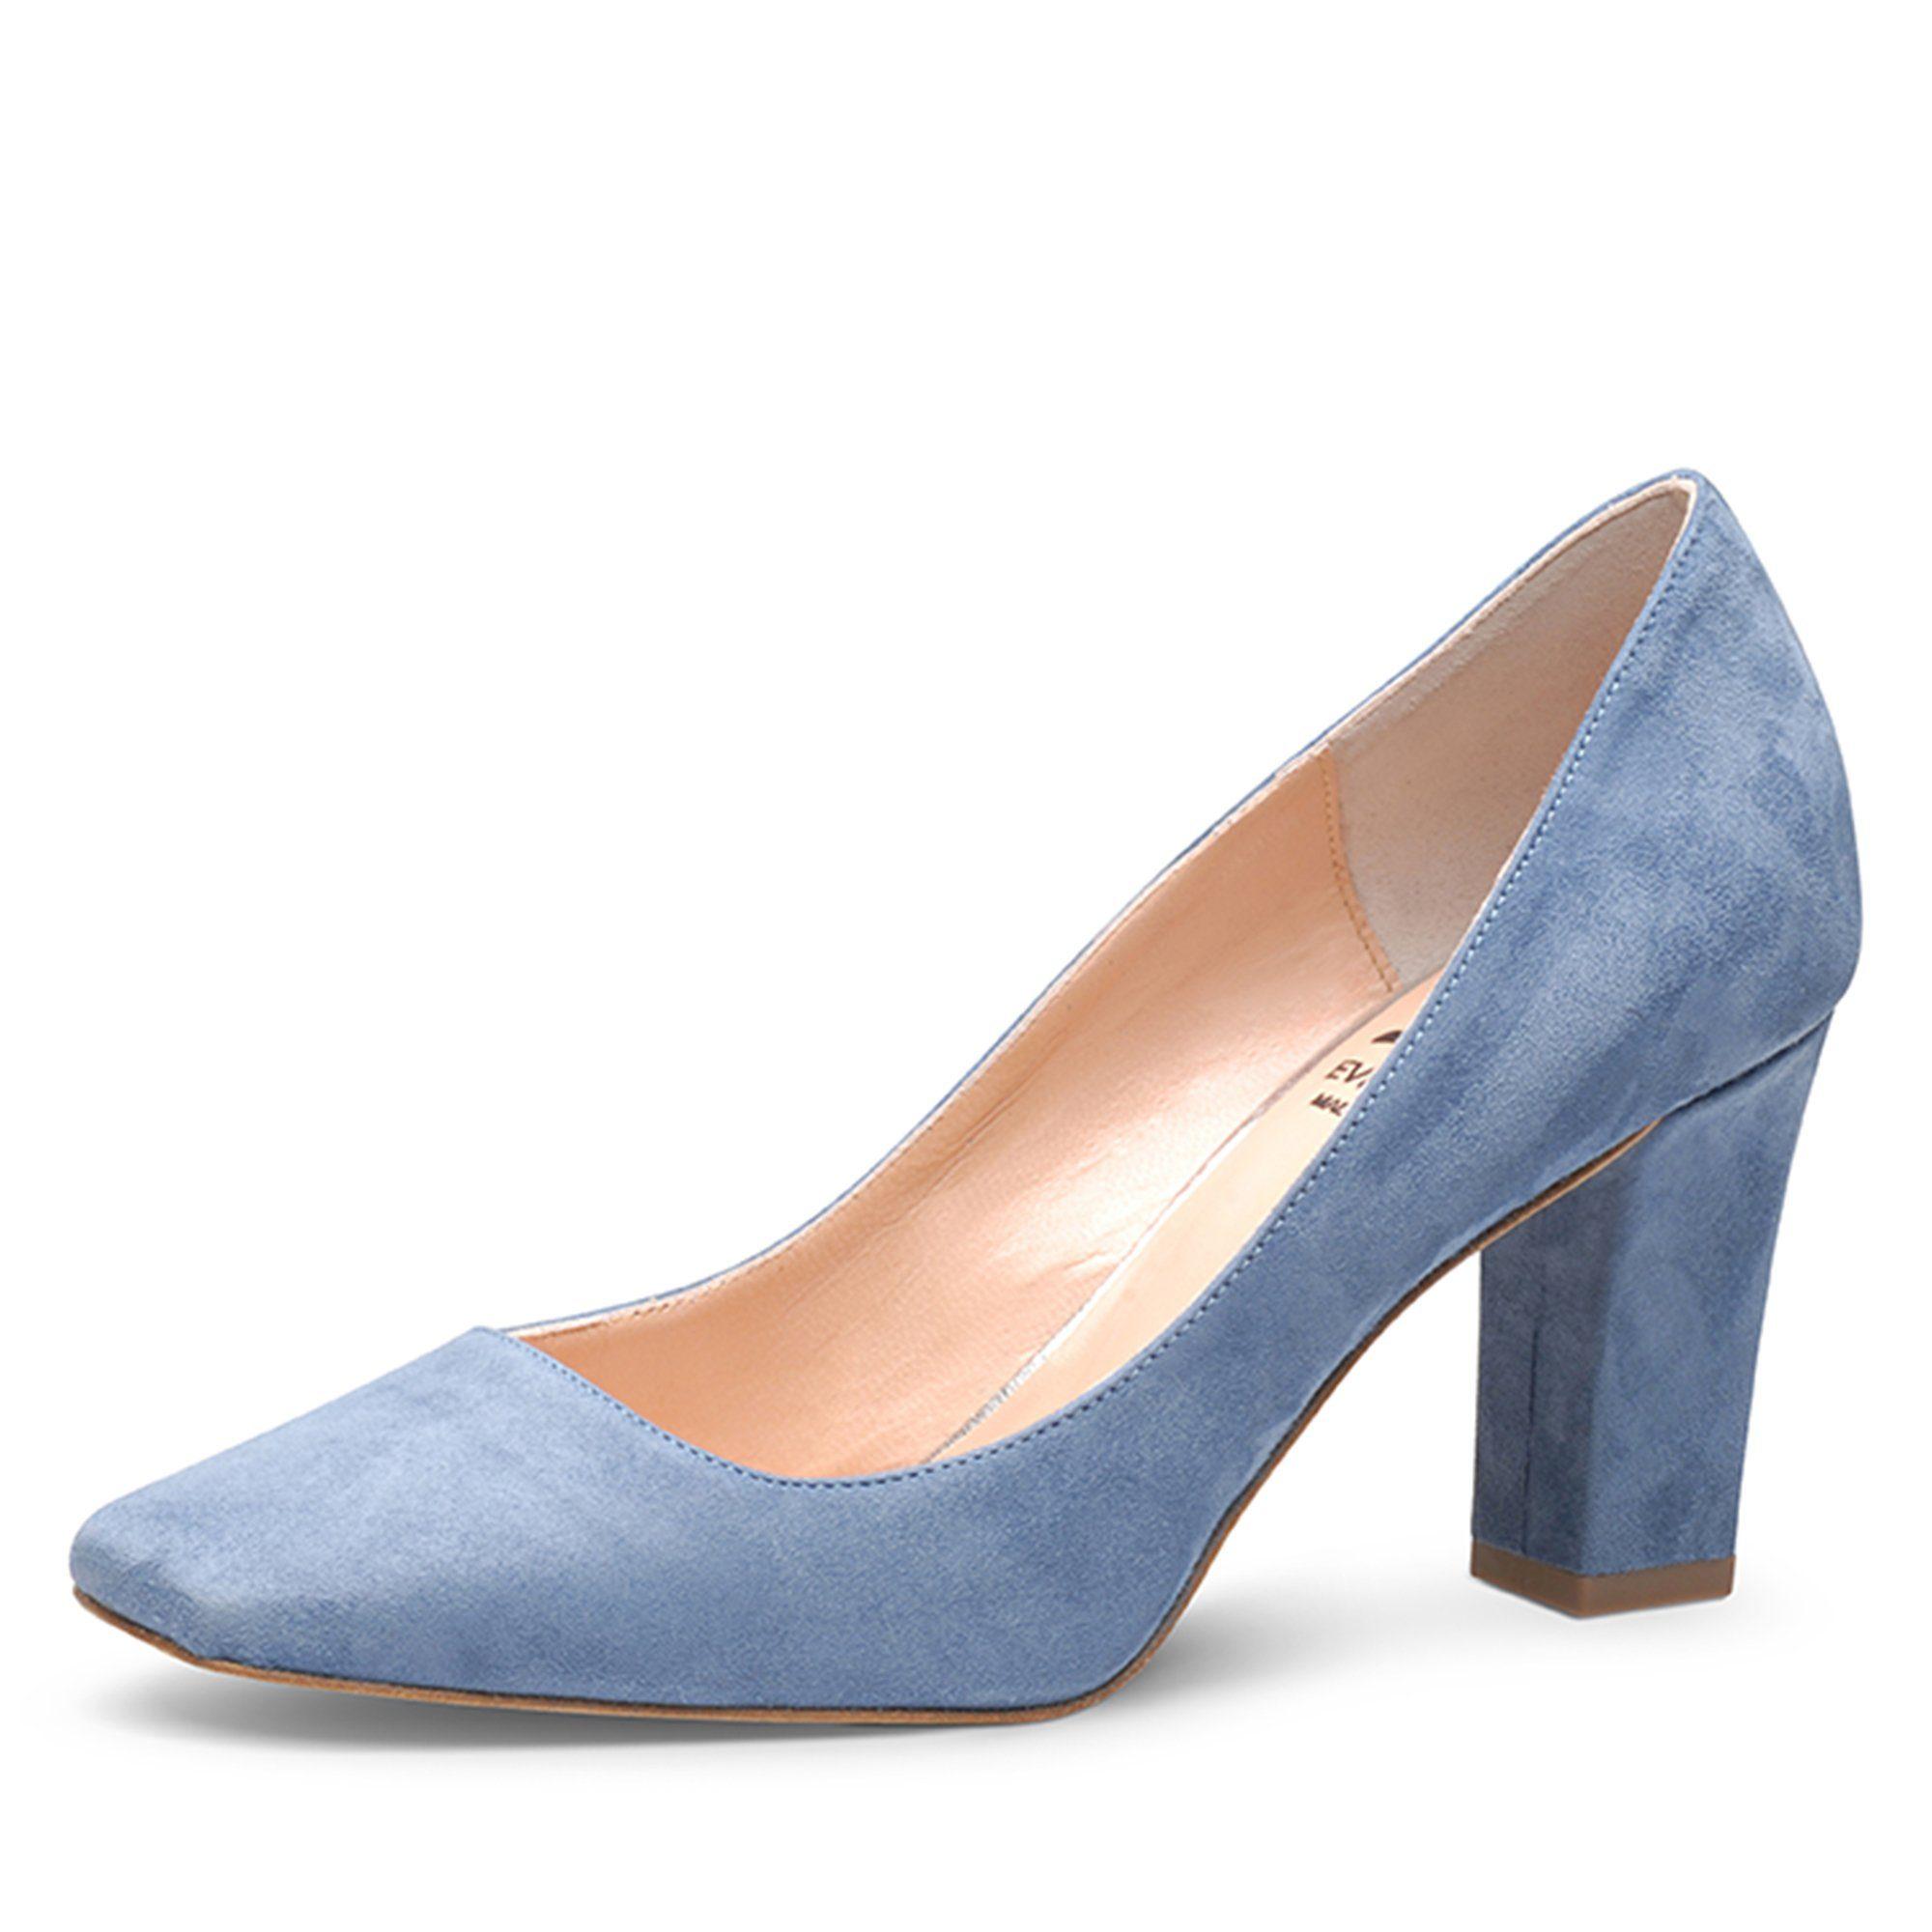 Evita FABIANA Pumps online kaufen  blau